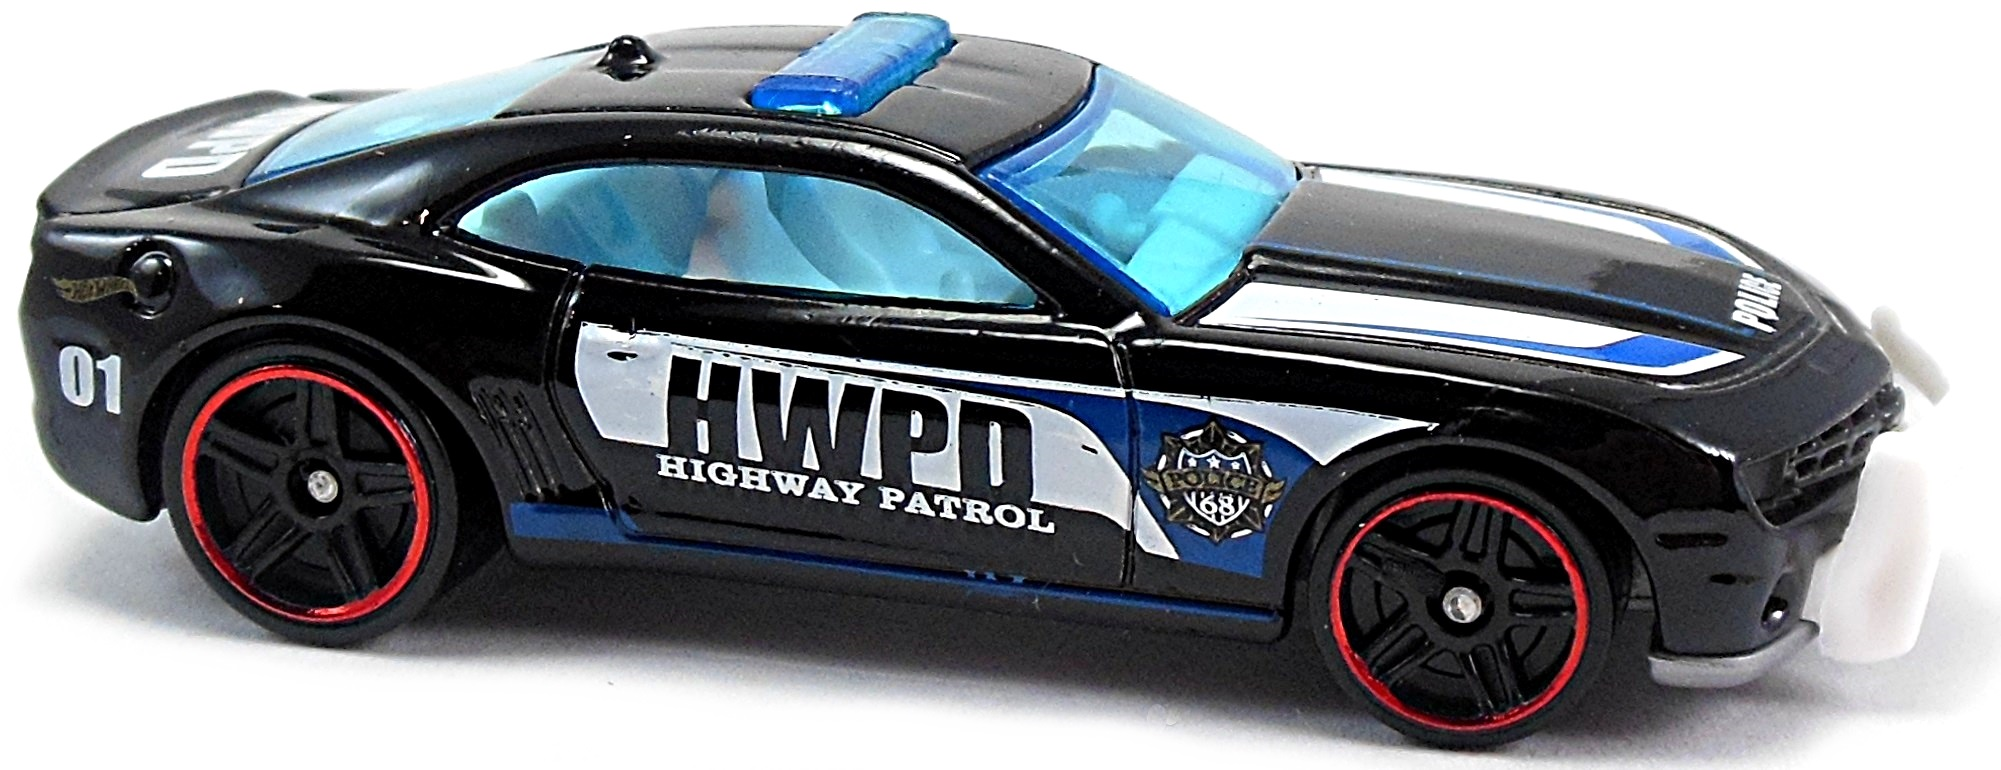 10 Camaro SS (police car) - 70mm - 2010 | Hot Wheels Newsletter